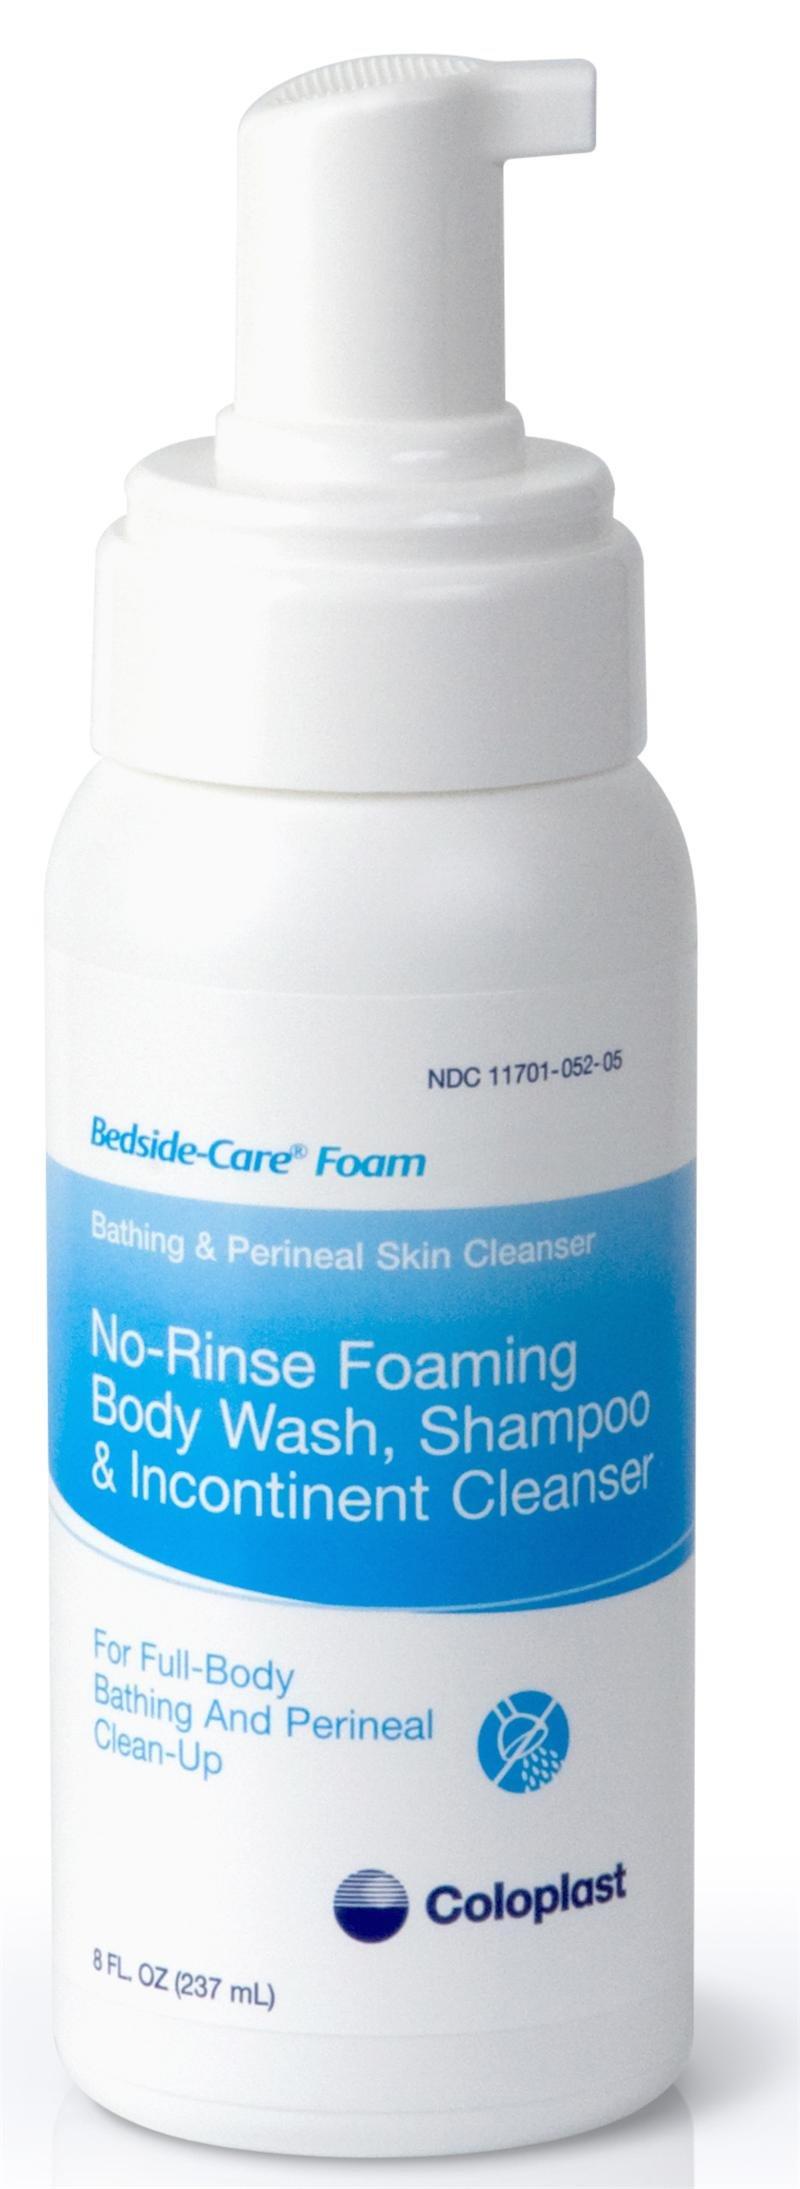 Coloplast Bedside Care Foam No Rinse Full Body Wash/Shampoo - Case of 12 - Model 7145 by Coloplast